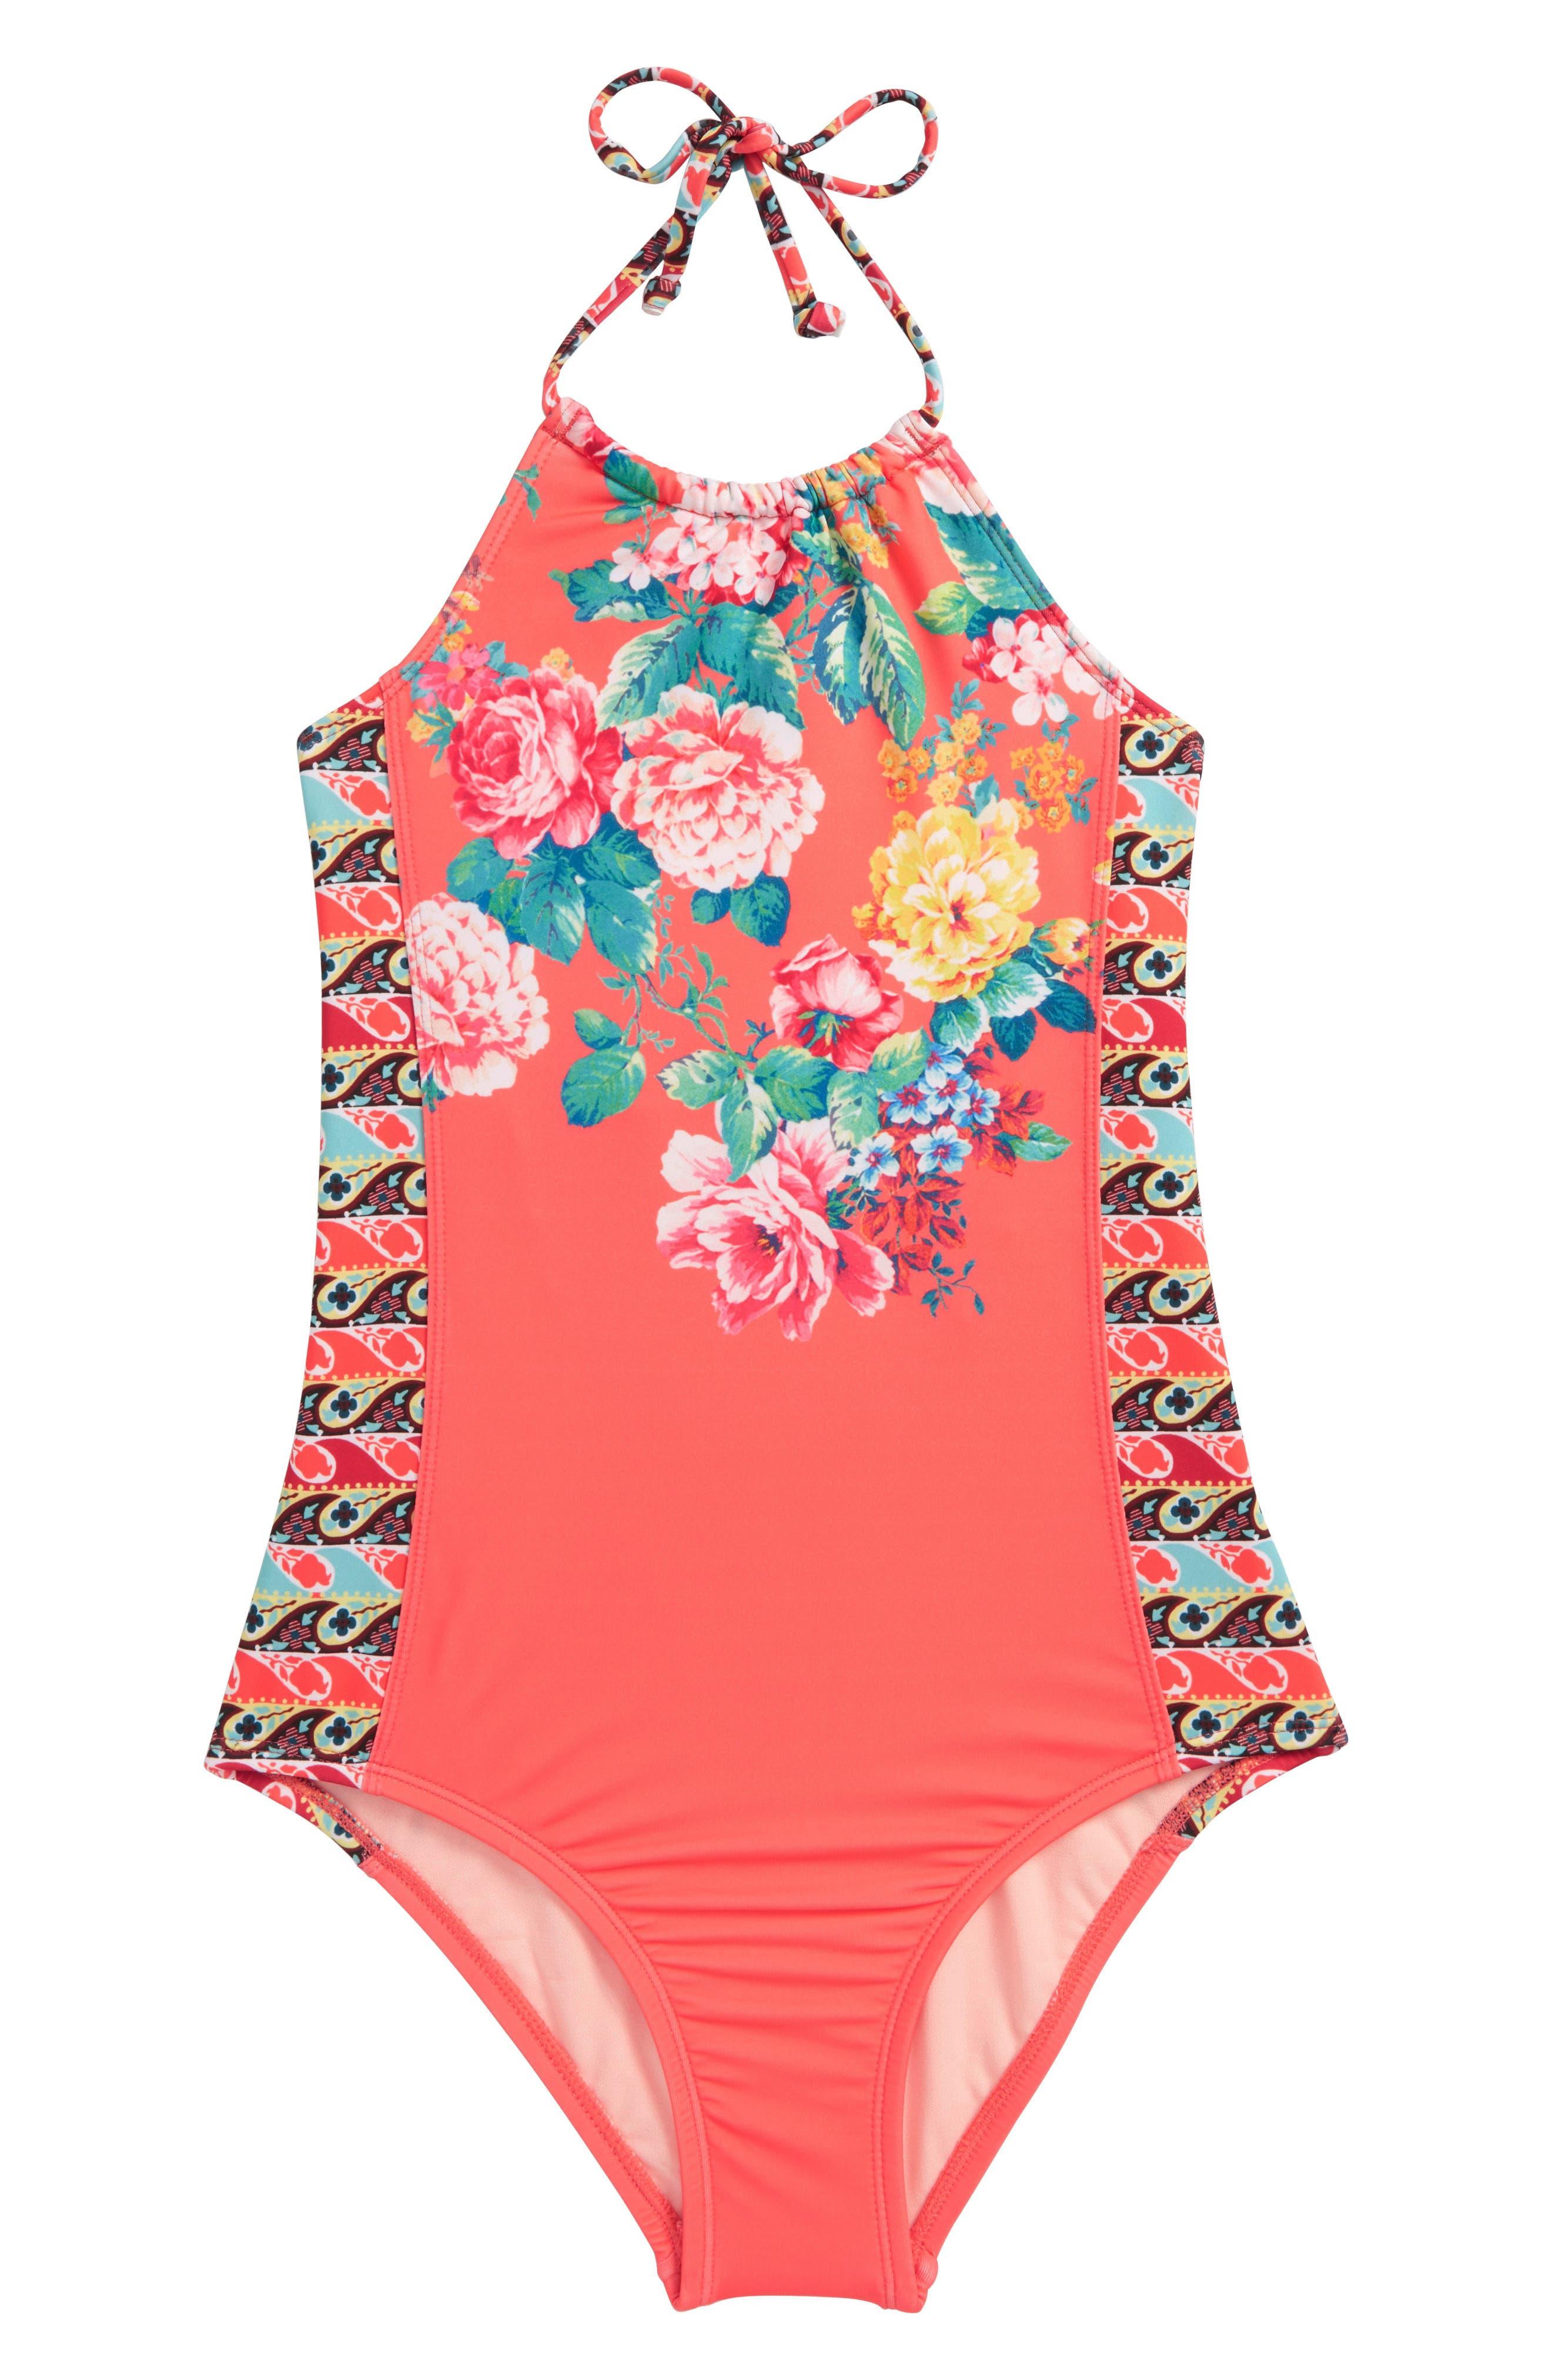 HOBIE Petal Pusher One-Piece Swimsuit, Main, color, 830